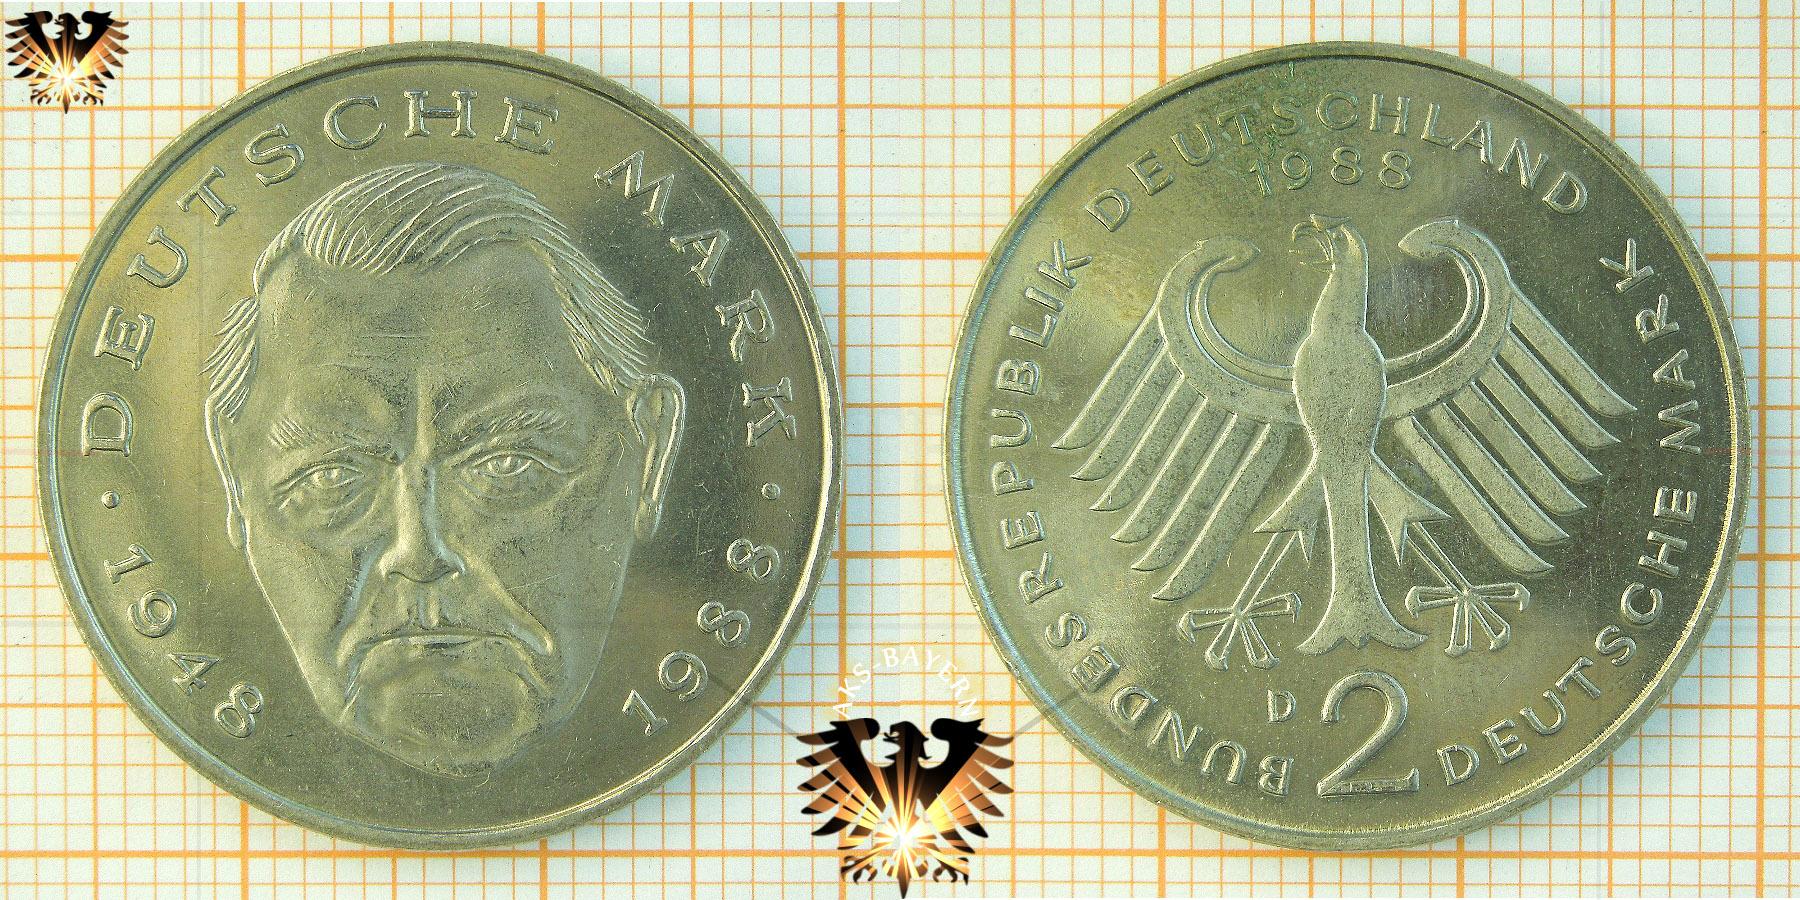 2 Dm Brd Ludwig Erhard 1948 Deutsche Mark Münze 1988